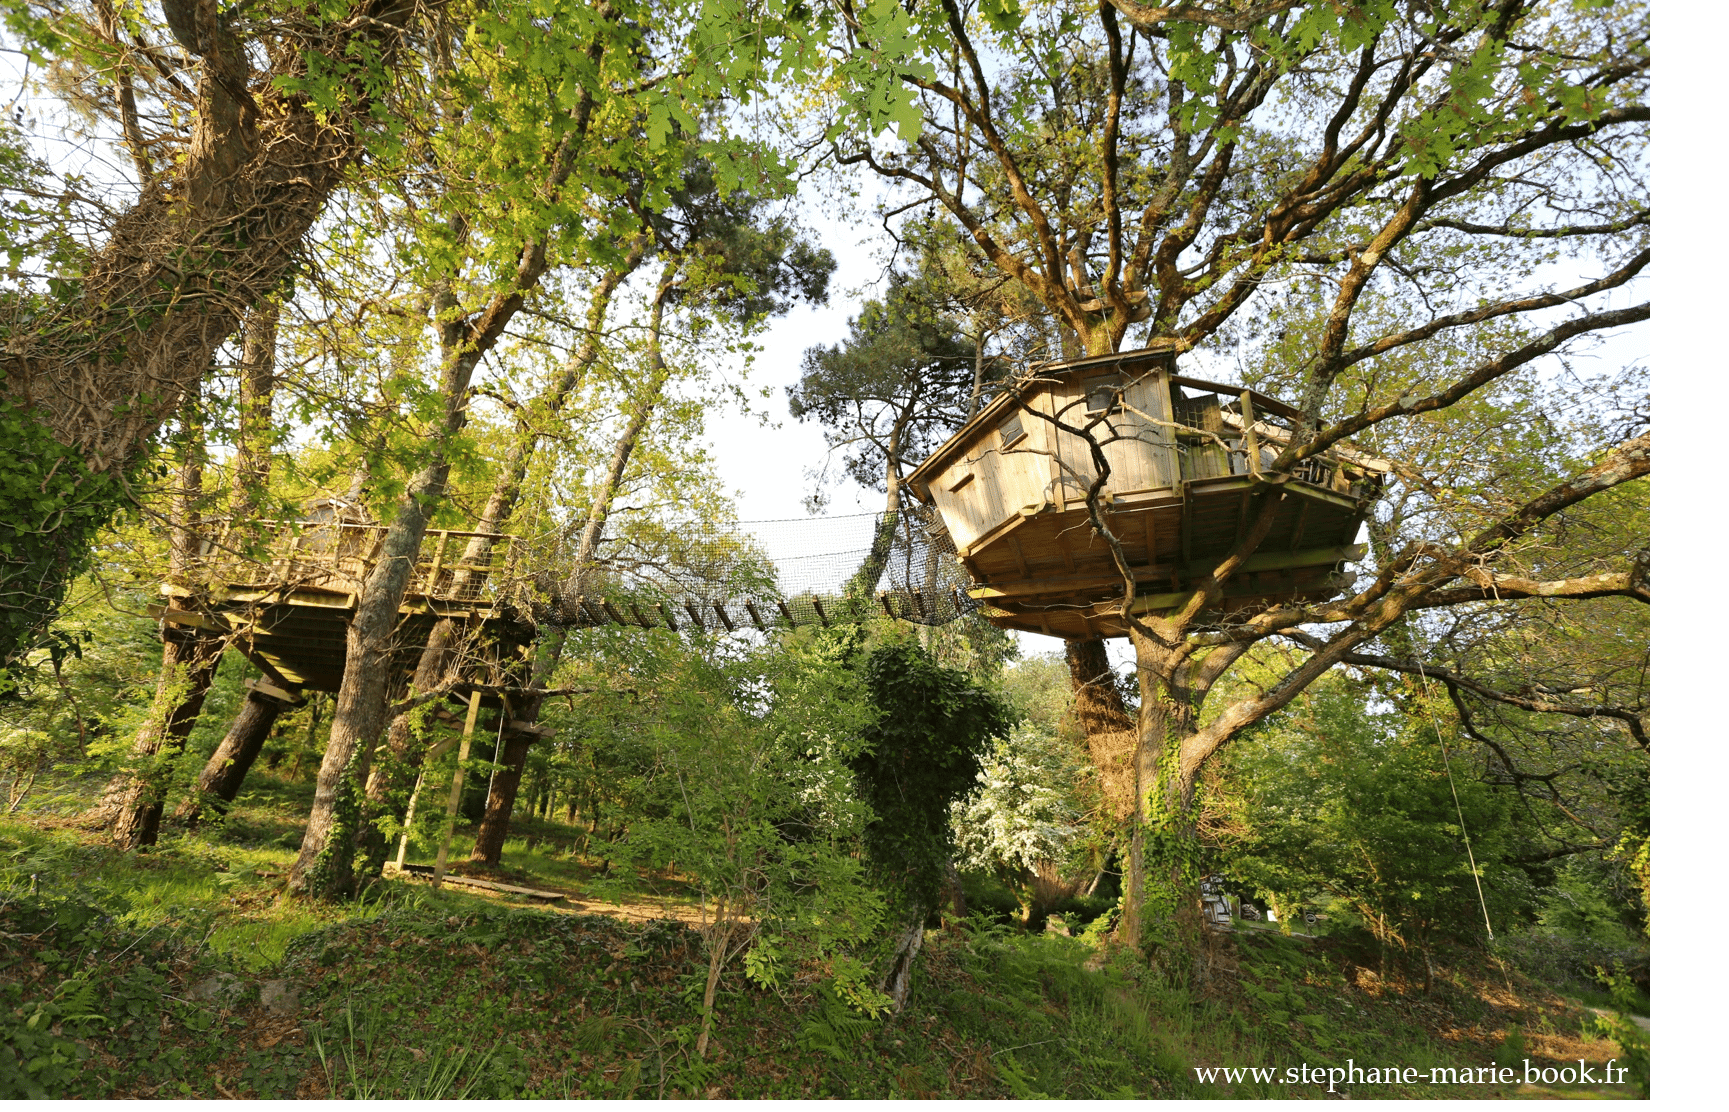 cabane dans les arbres pradan bretagne hotel dans les. Black Bedroom Furniture Sets. Home Design Ideas